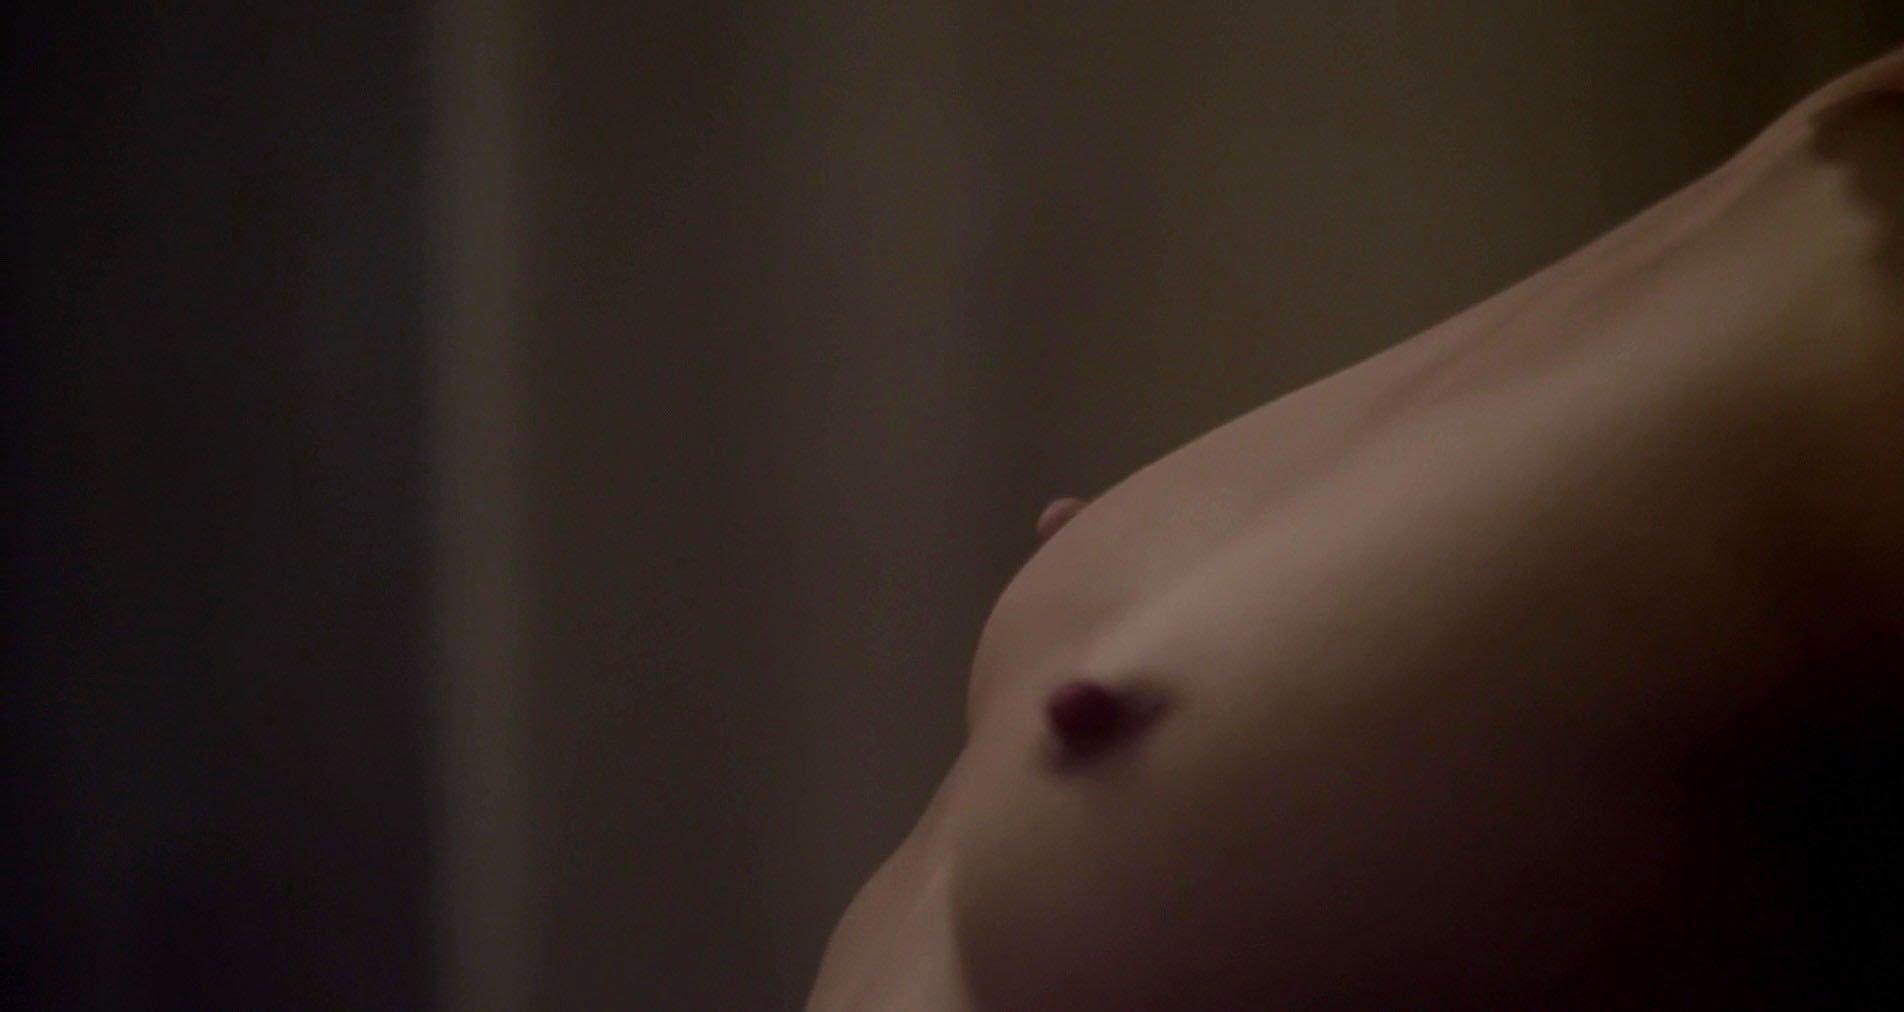 Rim job. briana evigan naked please